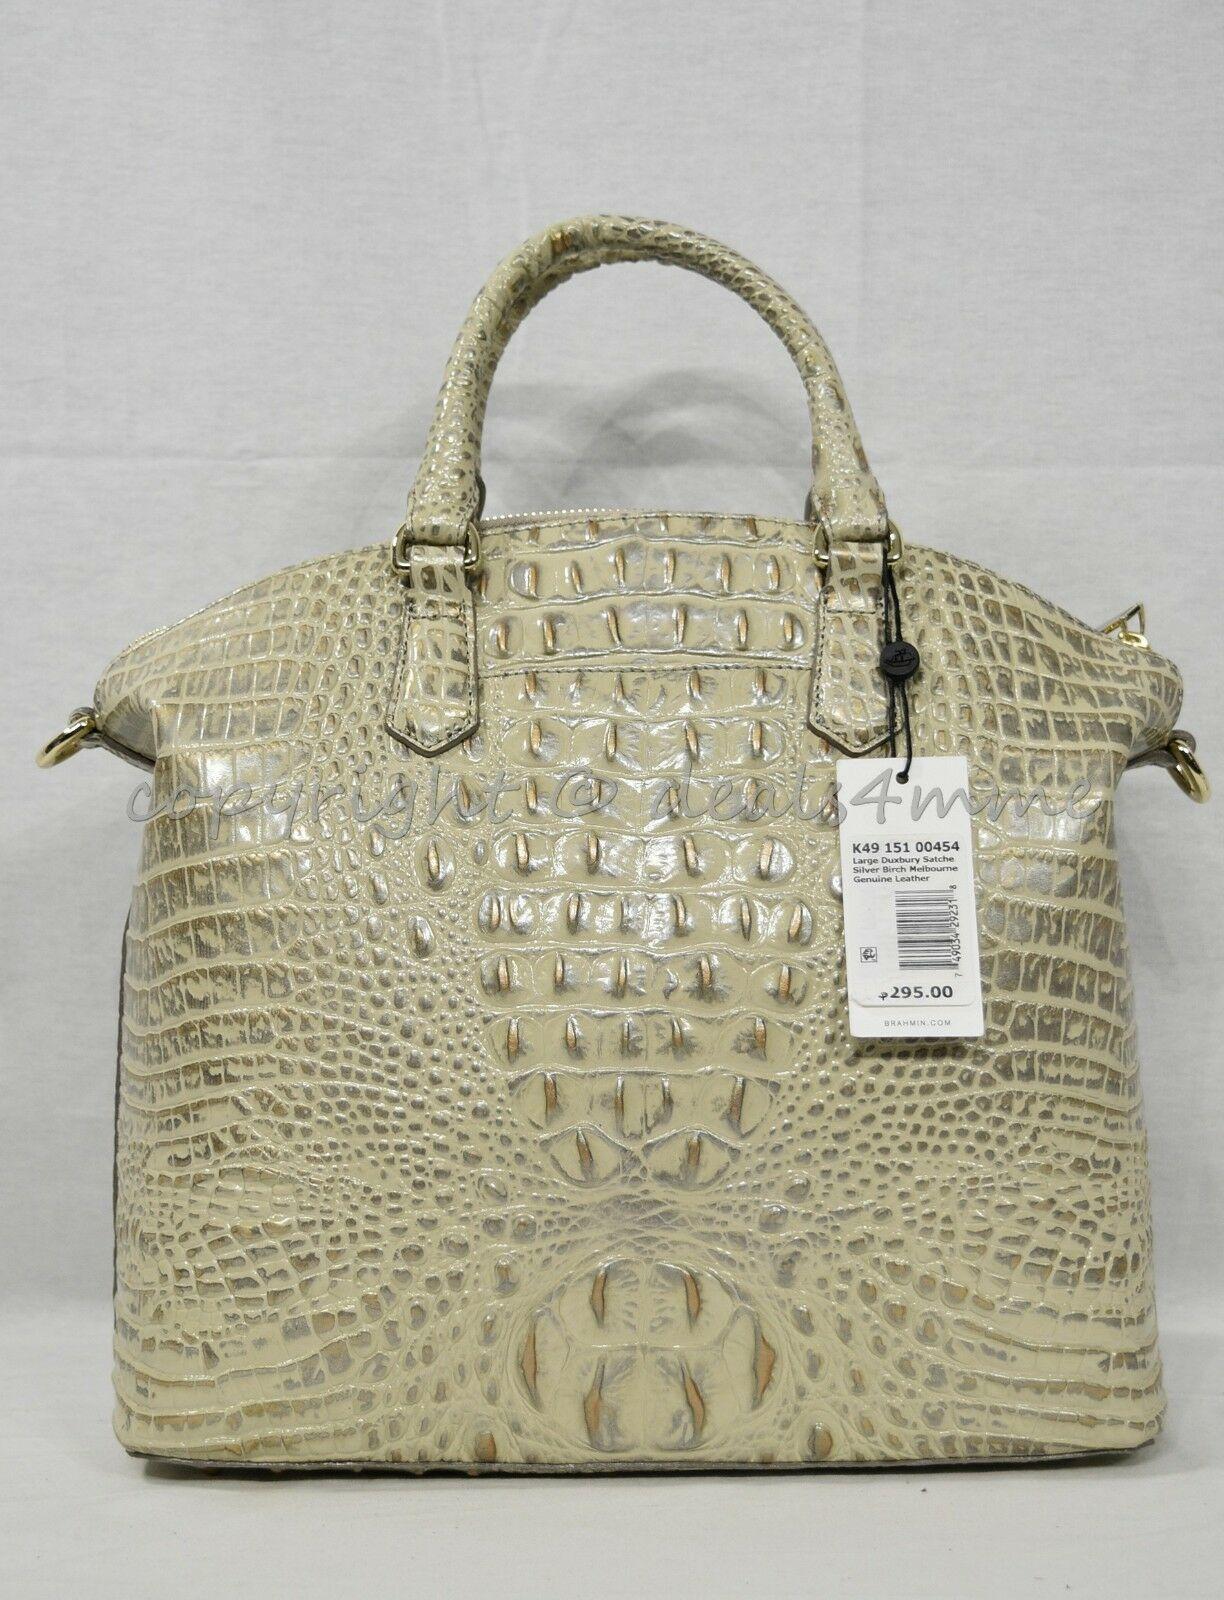 NWT Brahmin Large Leather Duxbury Satchel/Shoulder Bag in Silver Birch Melbourne image 3